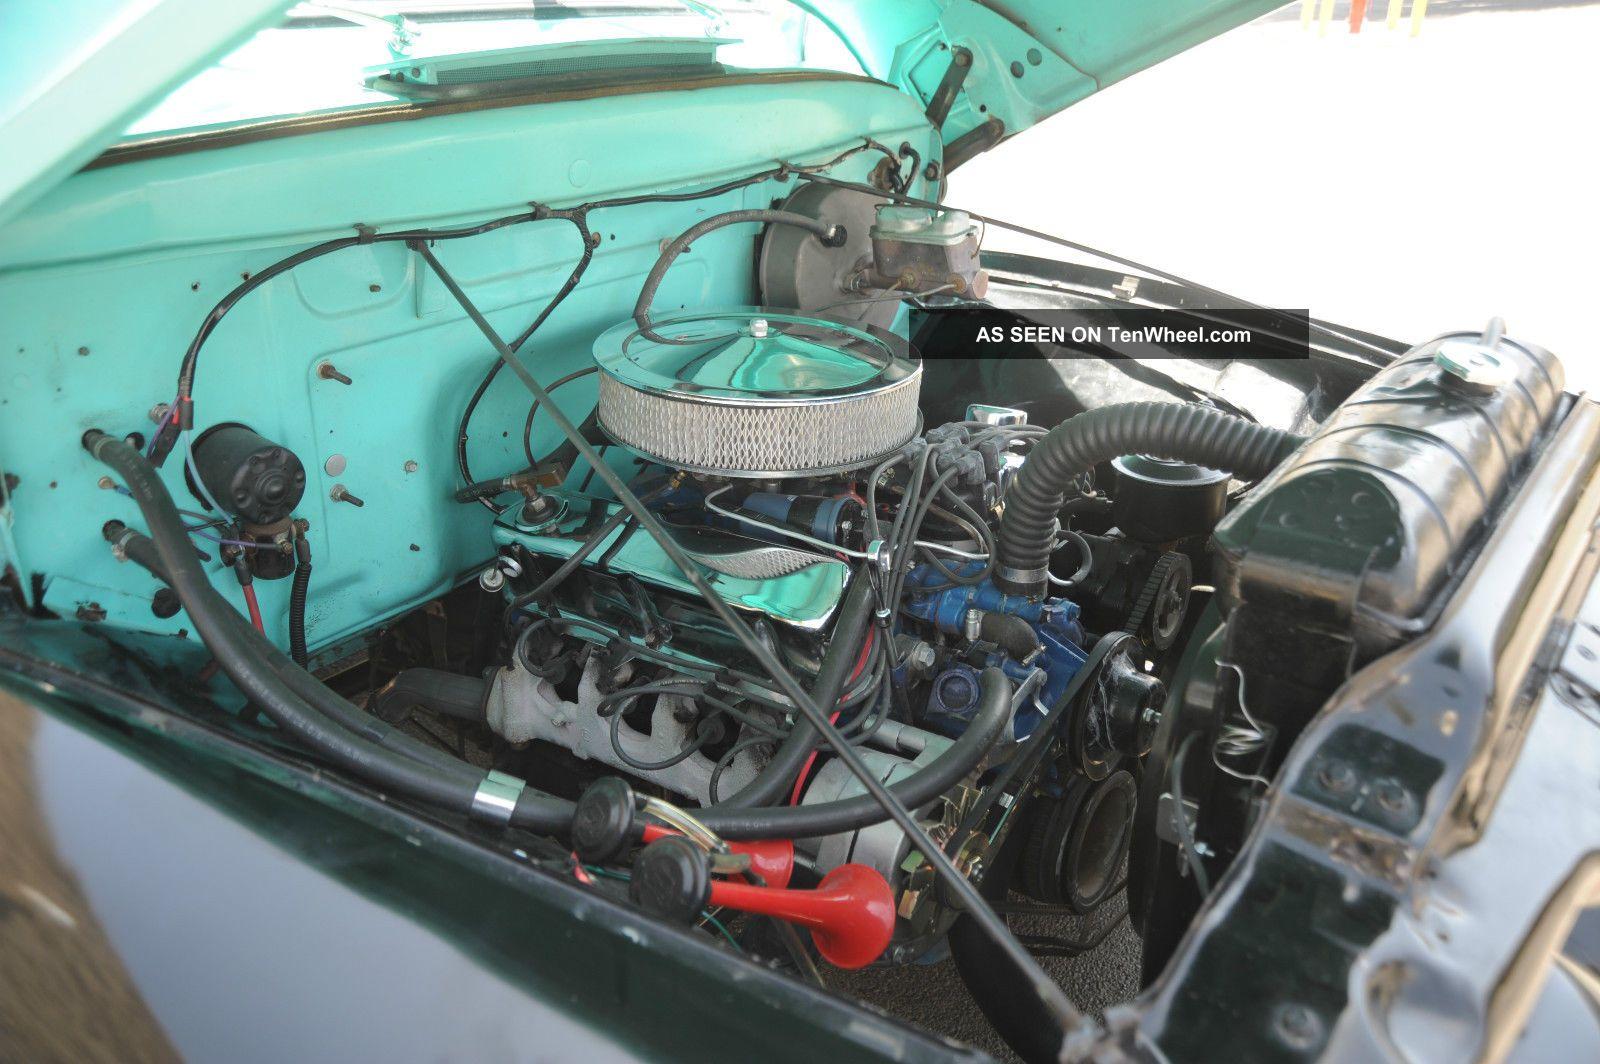 1955 Ford F100 Cool Resto Mod Vintage Truck With V8 Auto Digital Engine Dash Etc